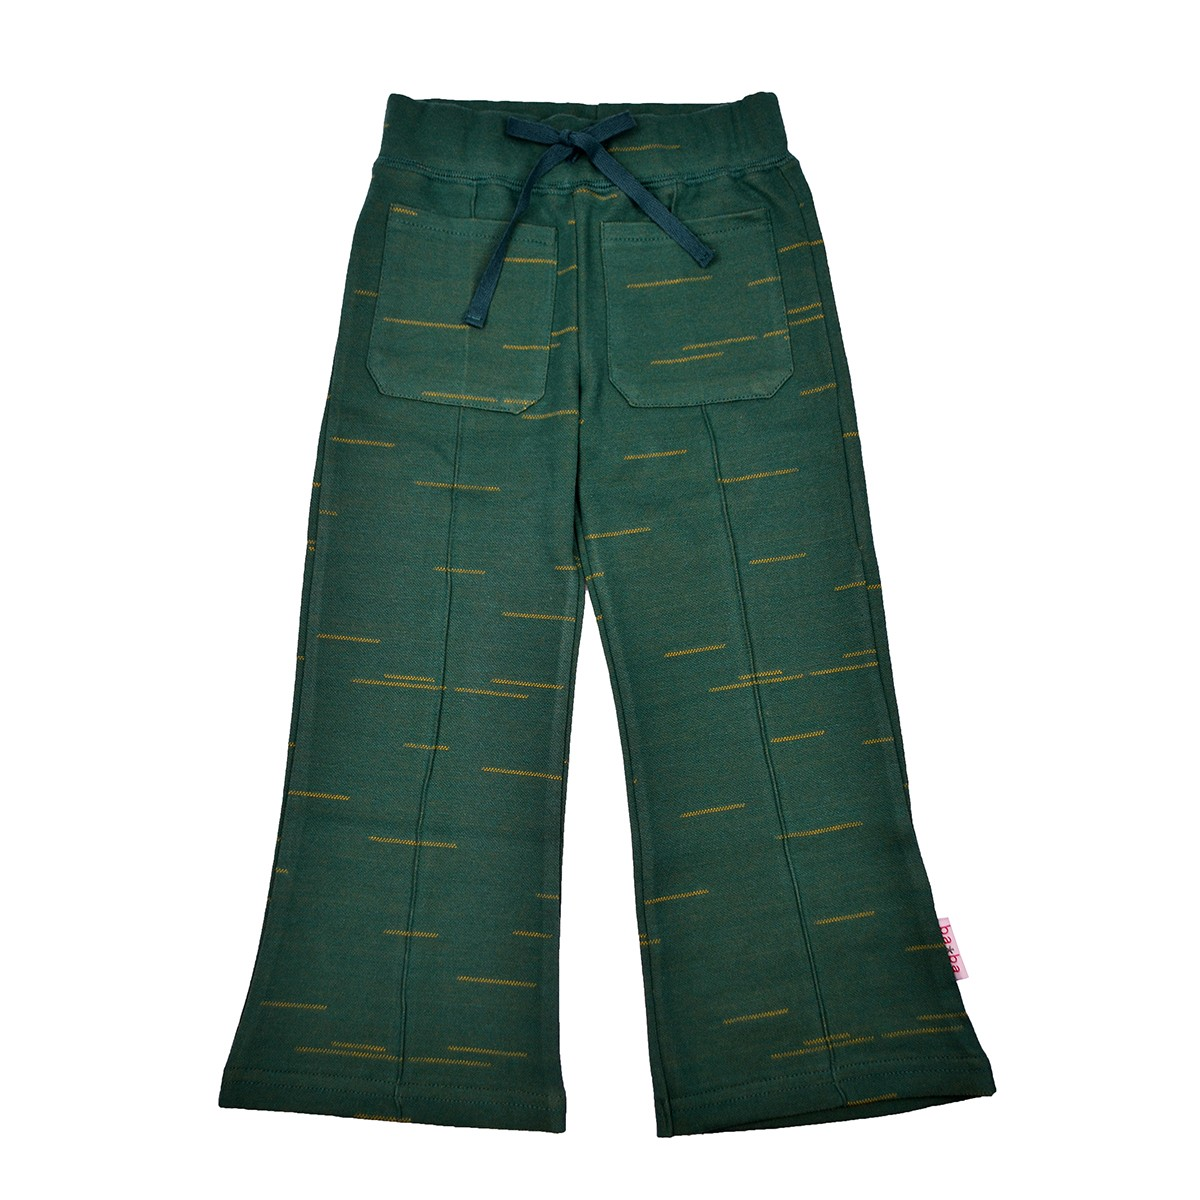 Pocketpant Green